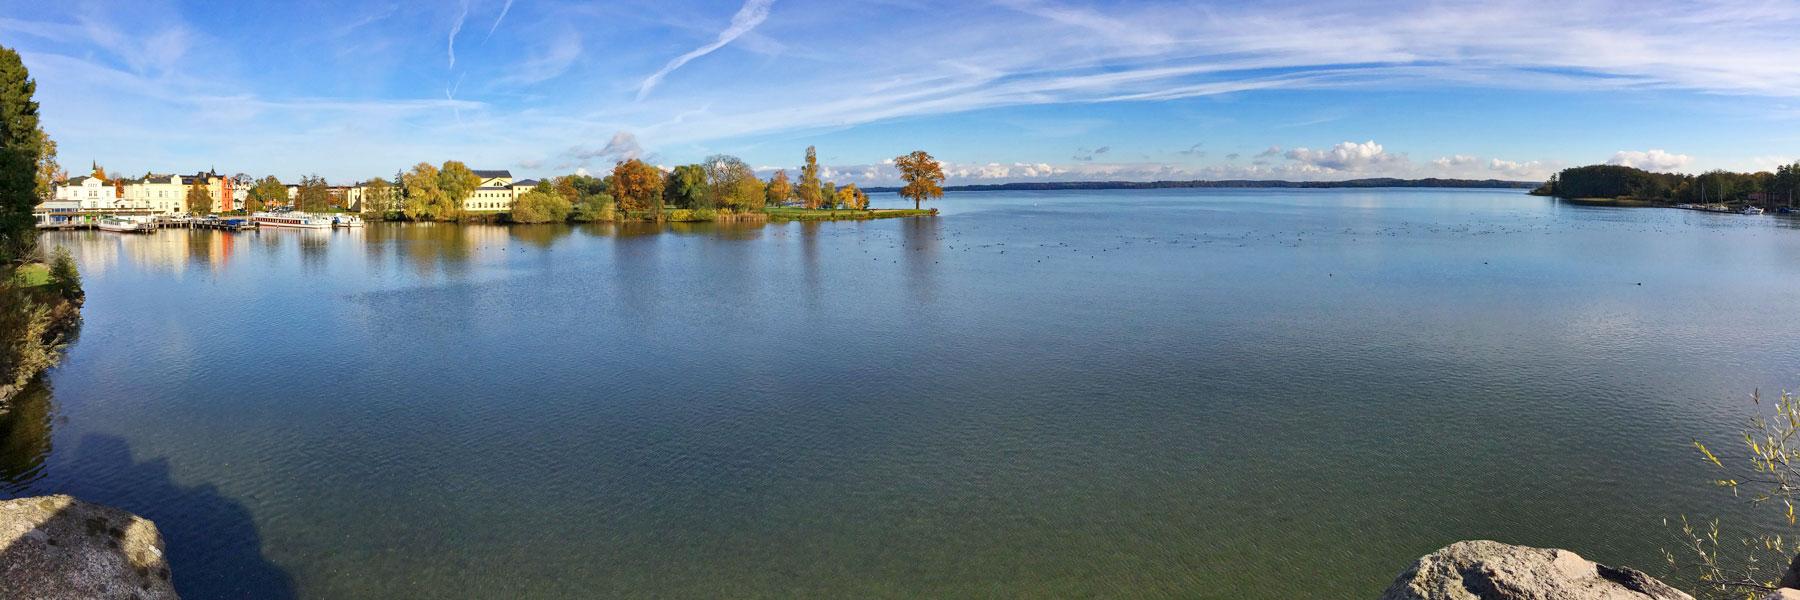 Schweriner See - Eventfloß Schwerin